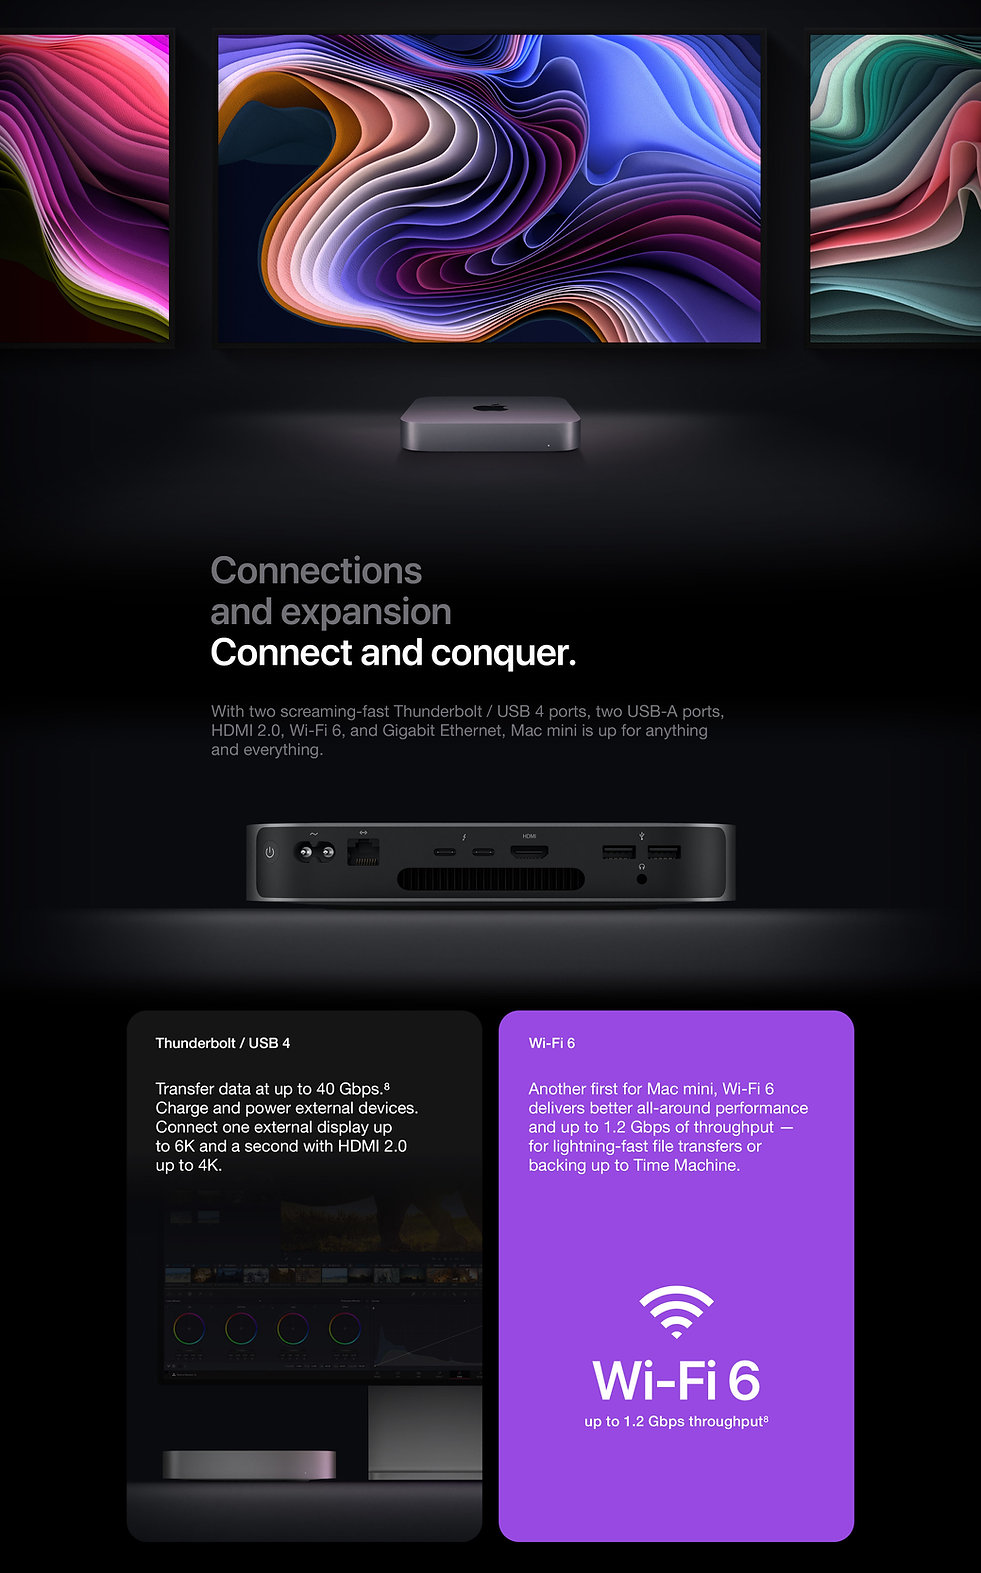 Mac mini overview 5.jpg